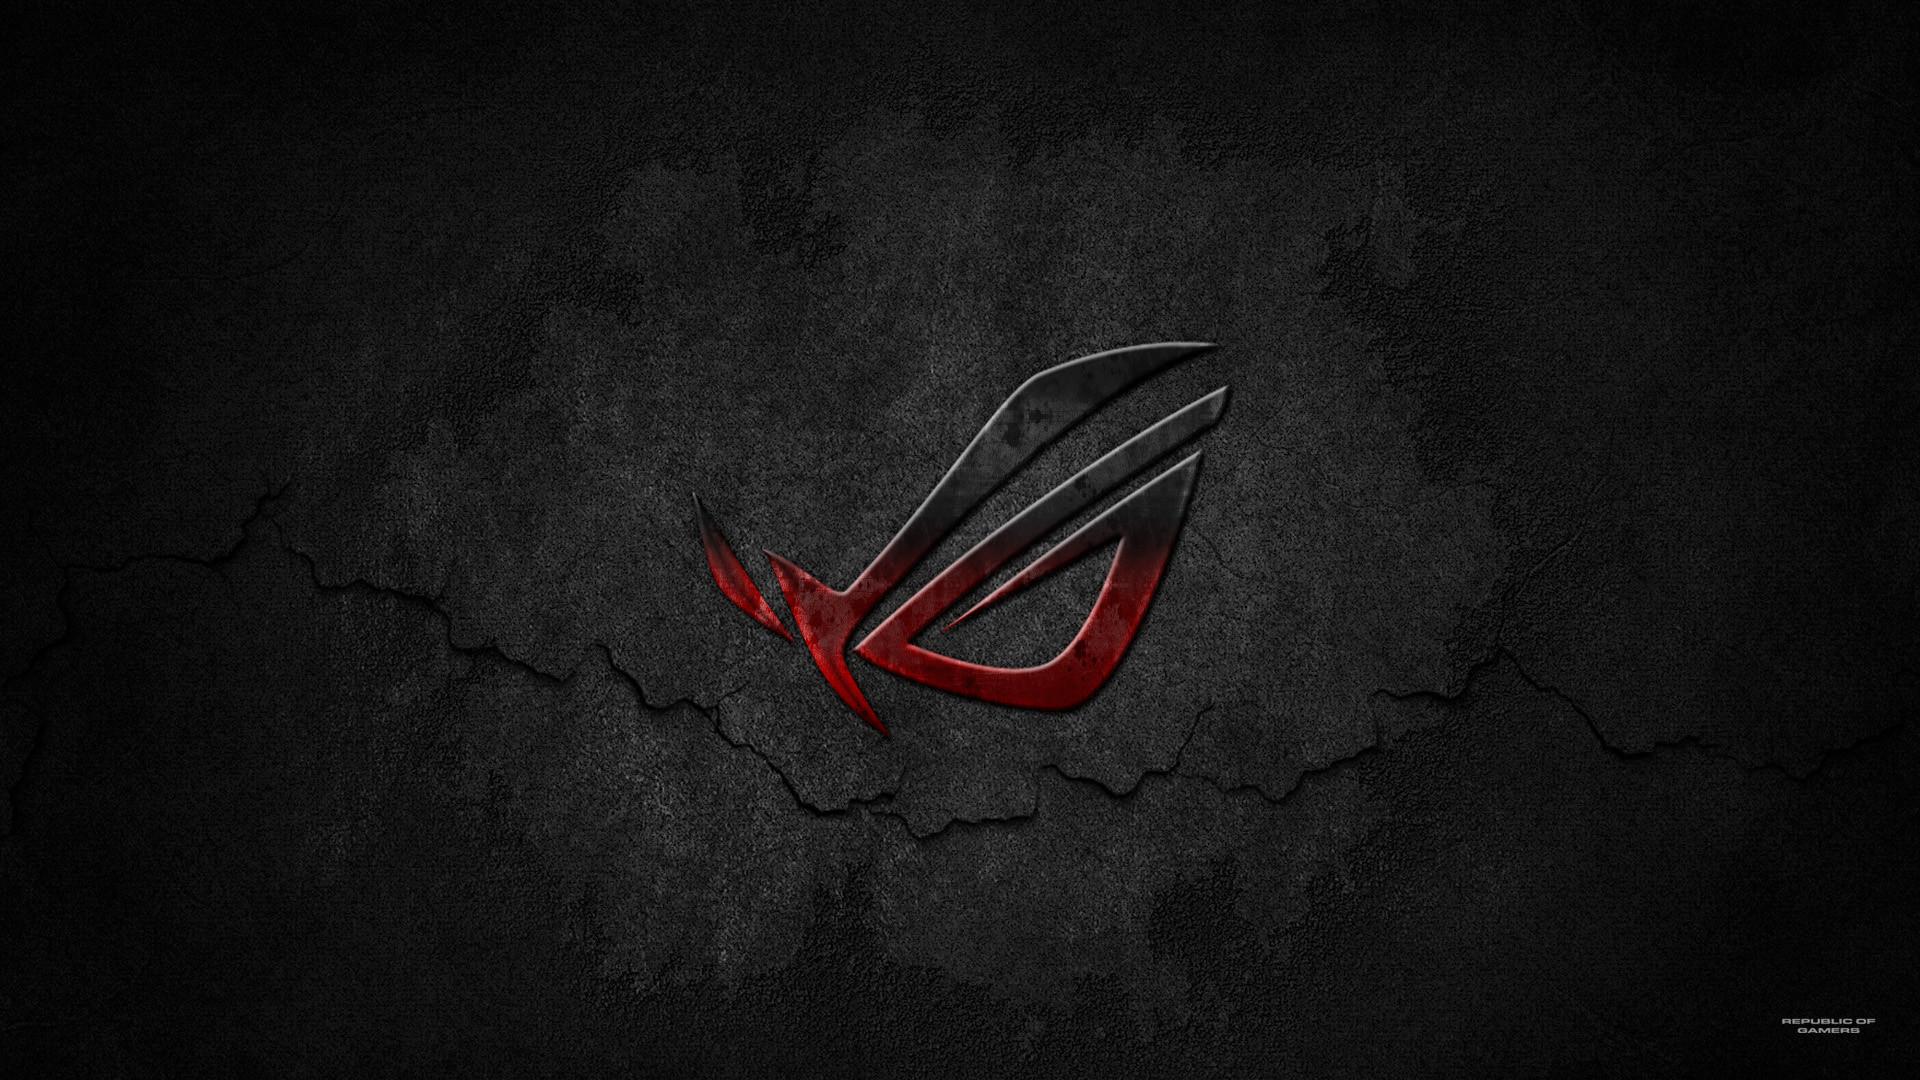 Asus ROG : Republic of gamers – YouTube